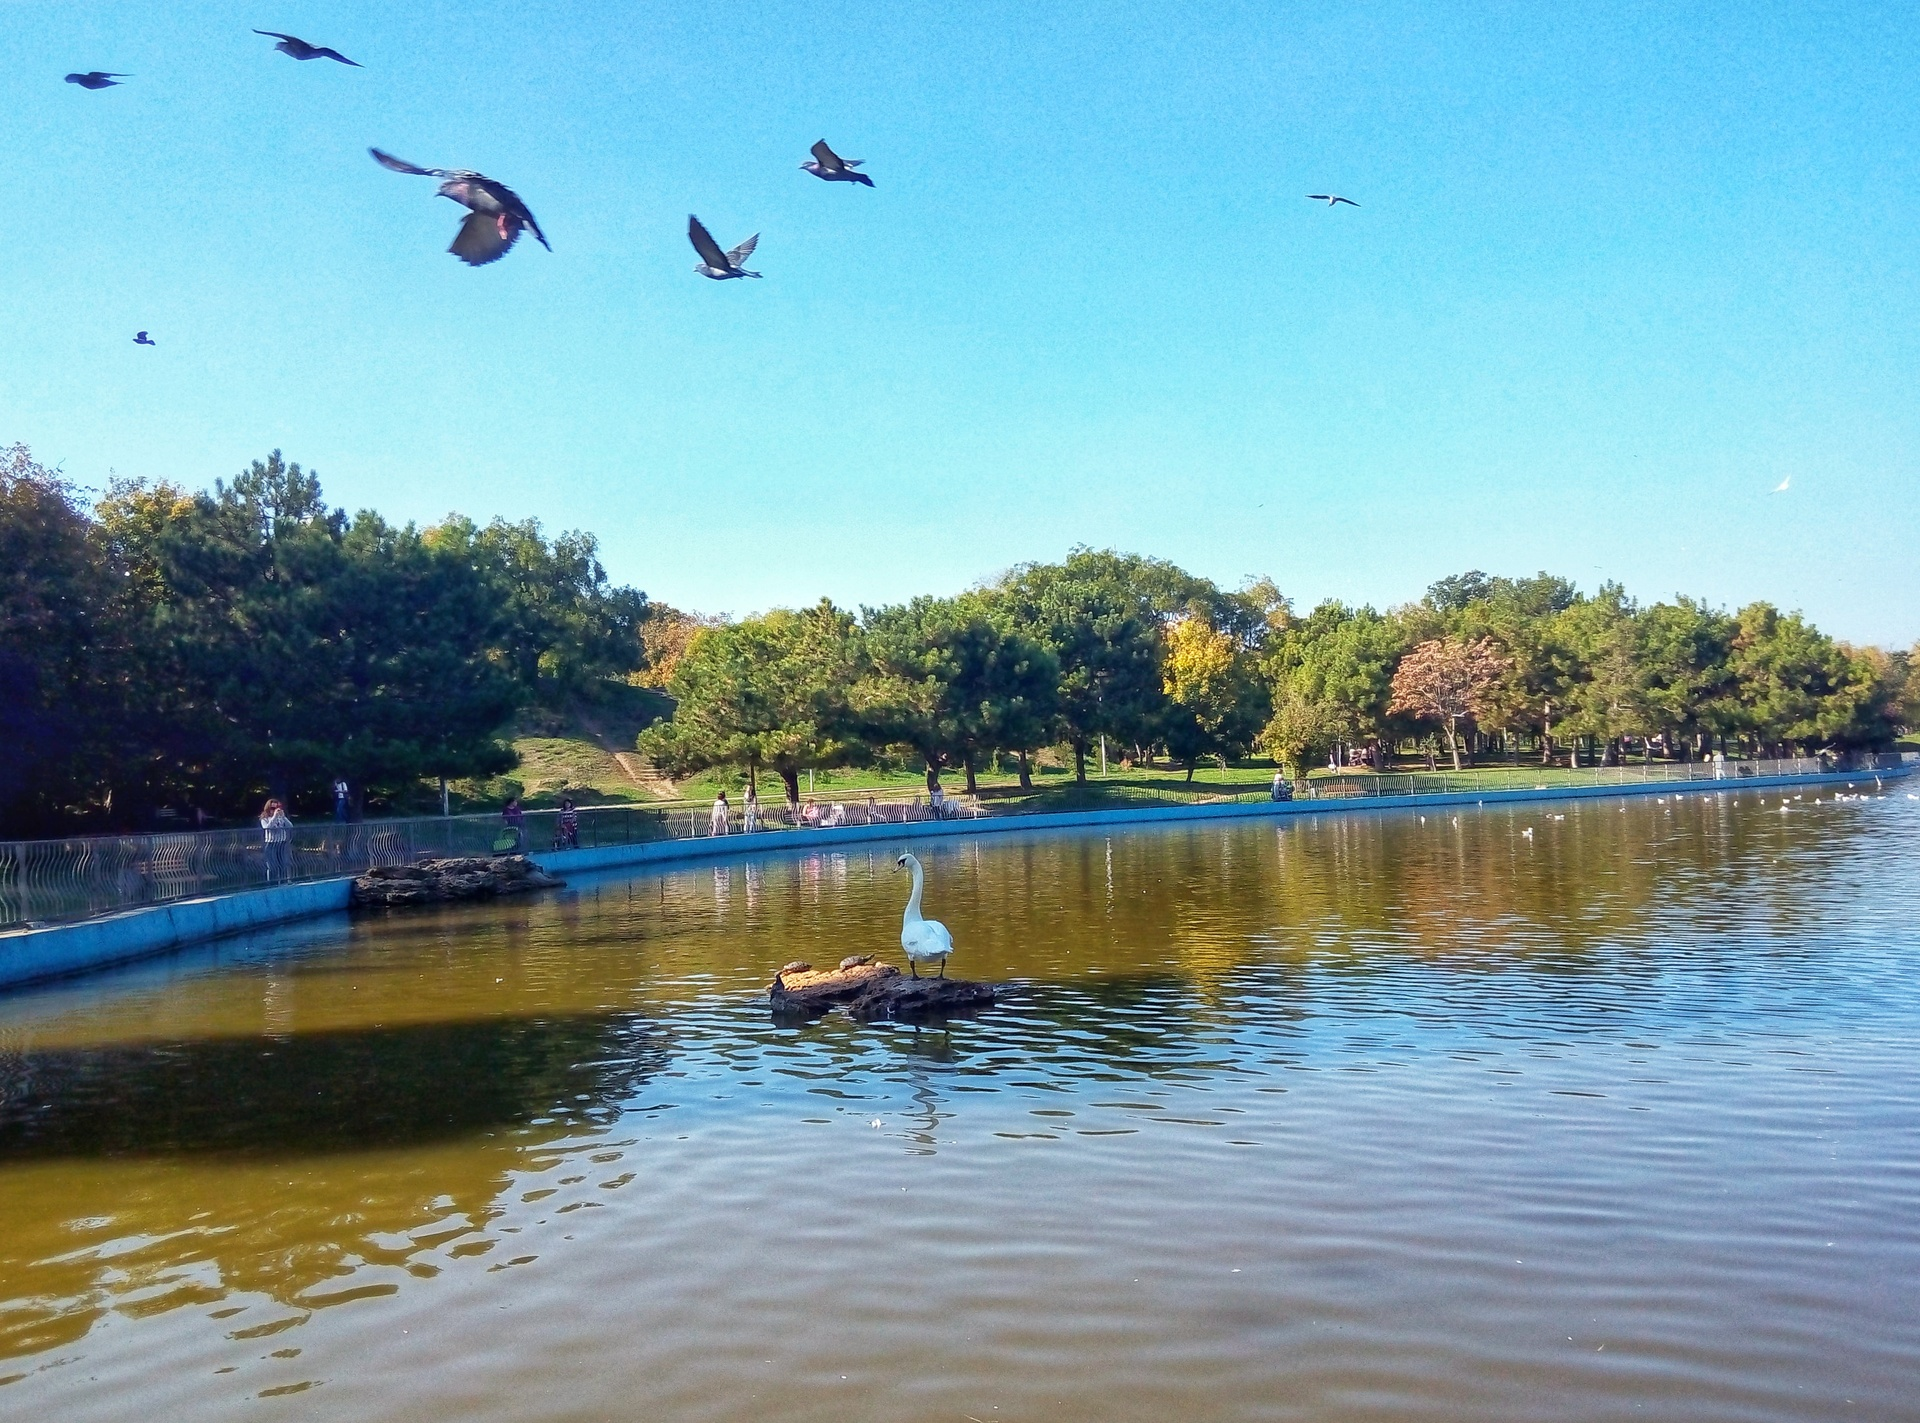 swan on the lake лебедь на озере